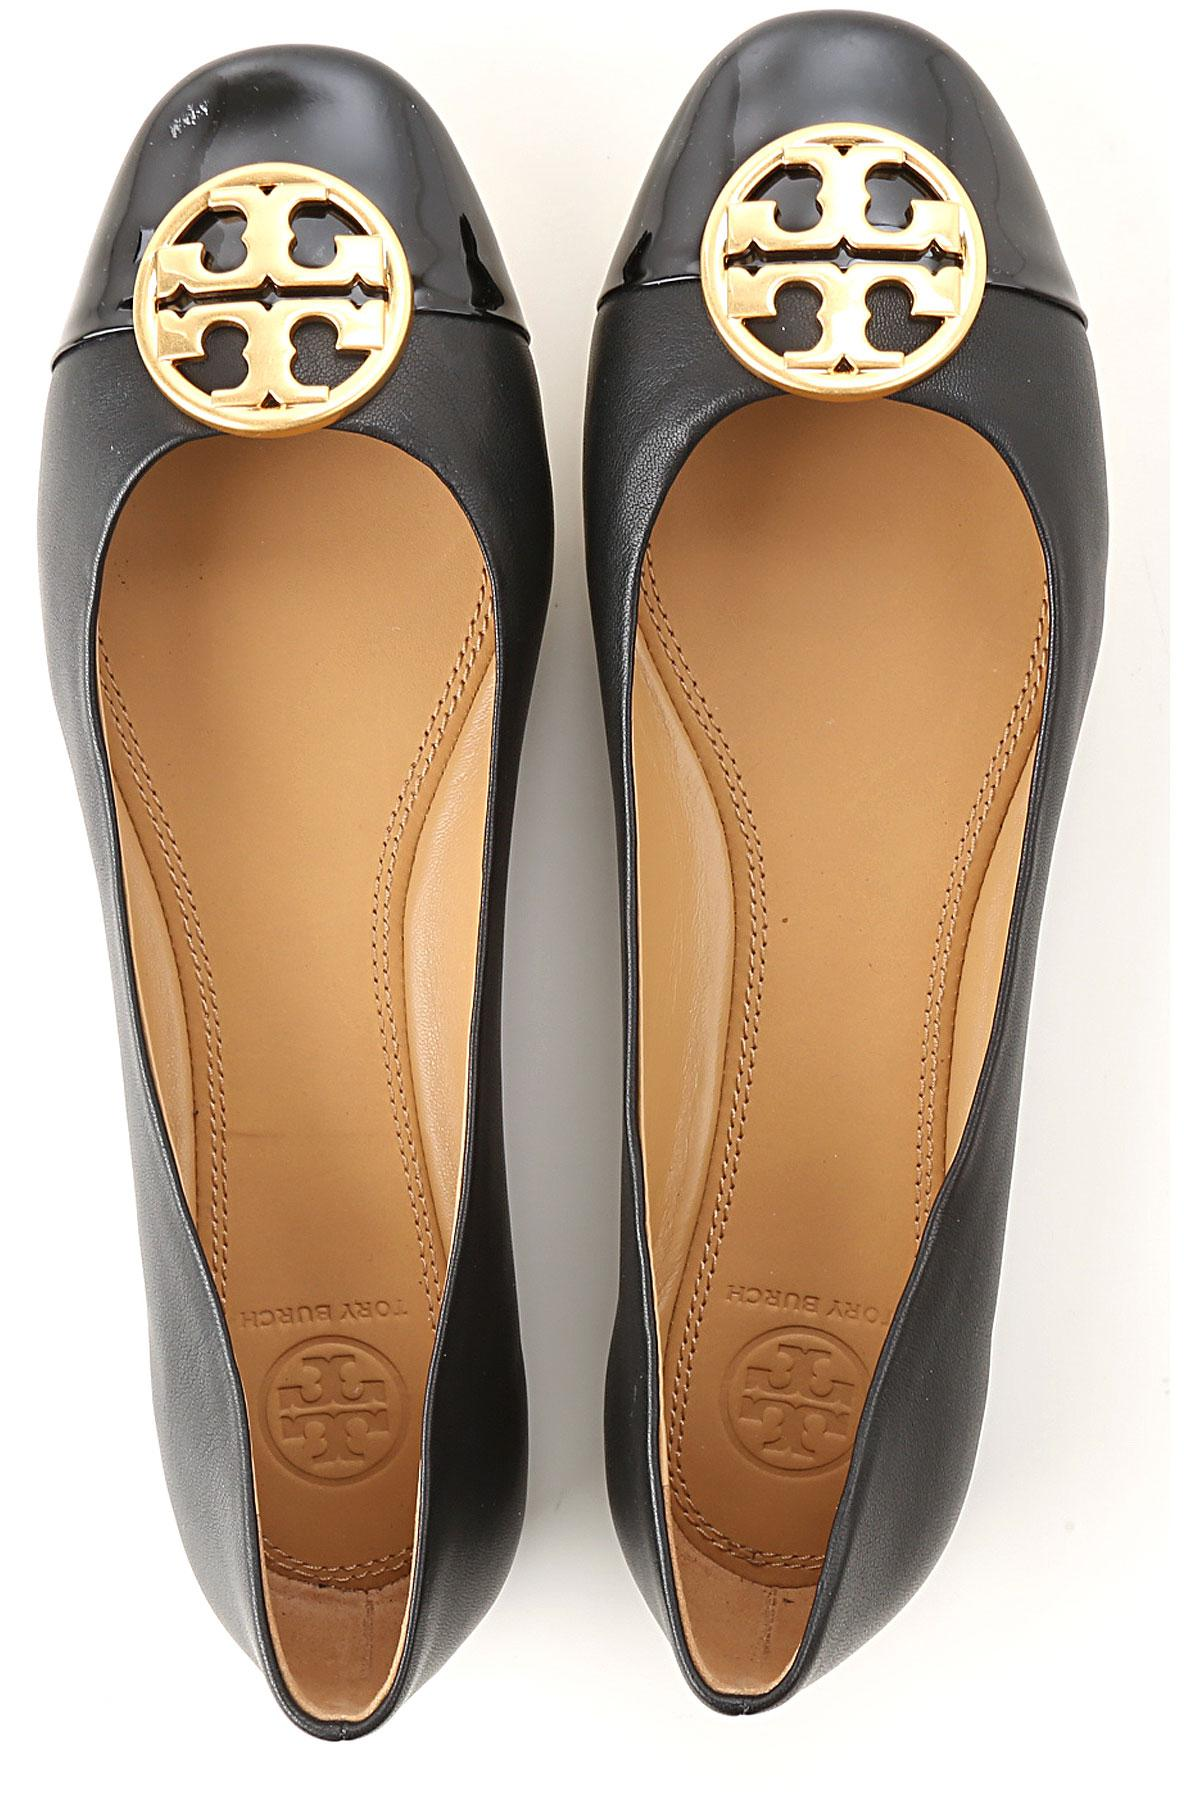 7b08da42ac2 Lyst - Tory Burch Ballet Flats Ballerina Shoes For Women On Sale in ...